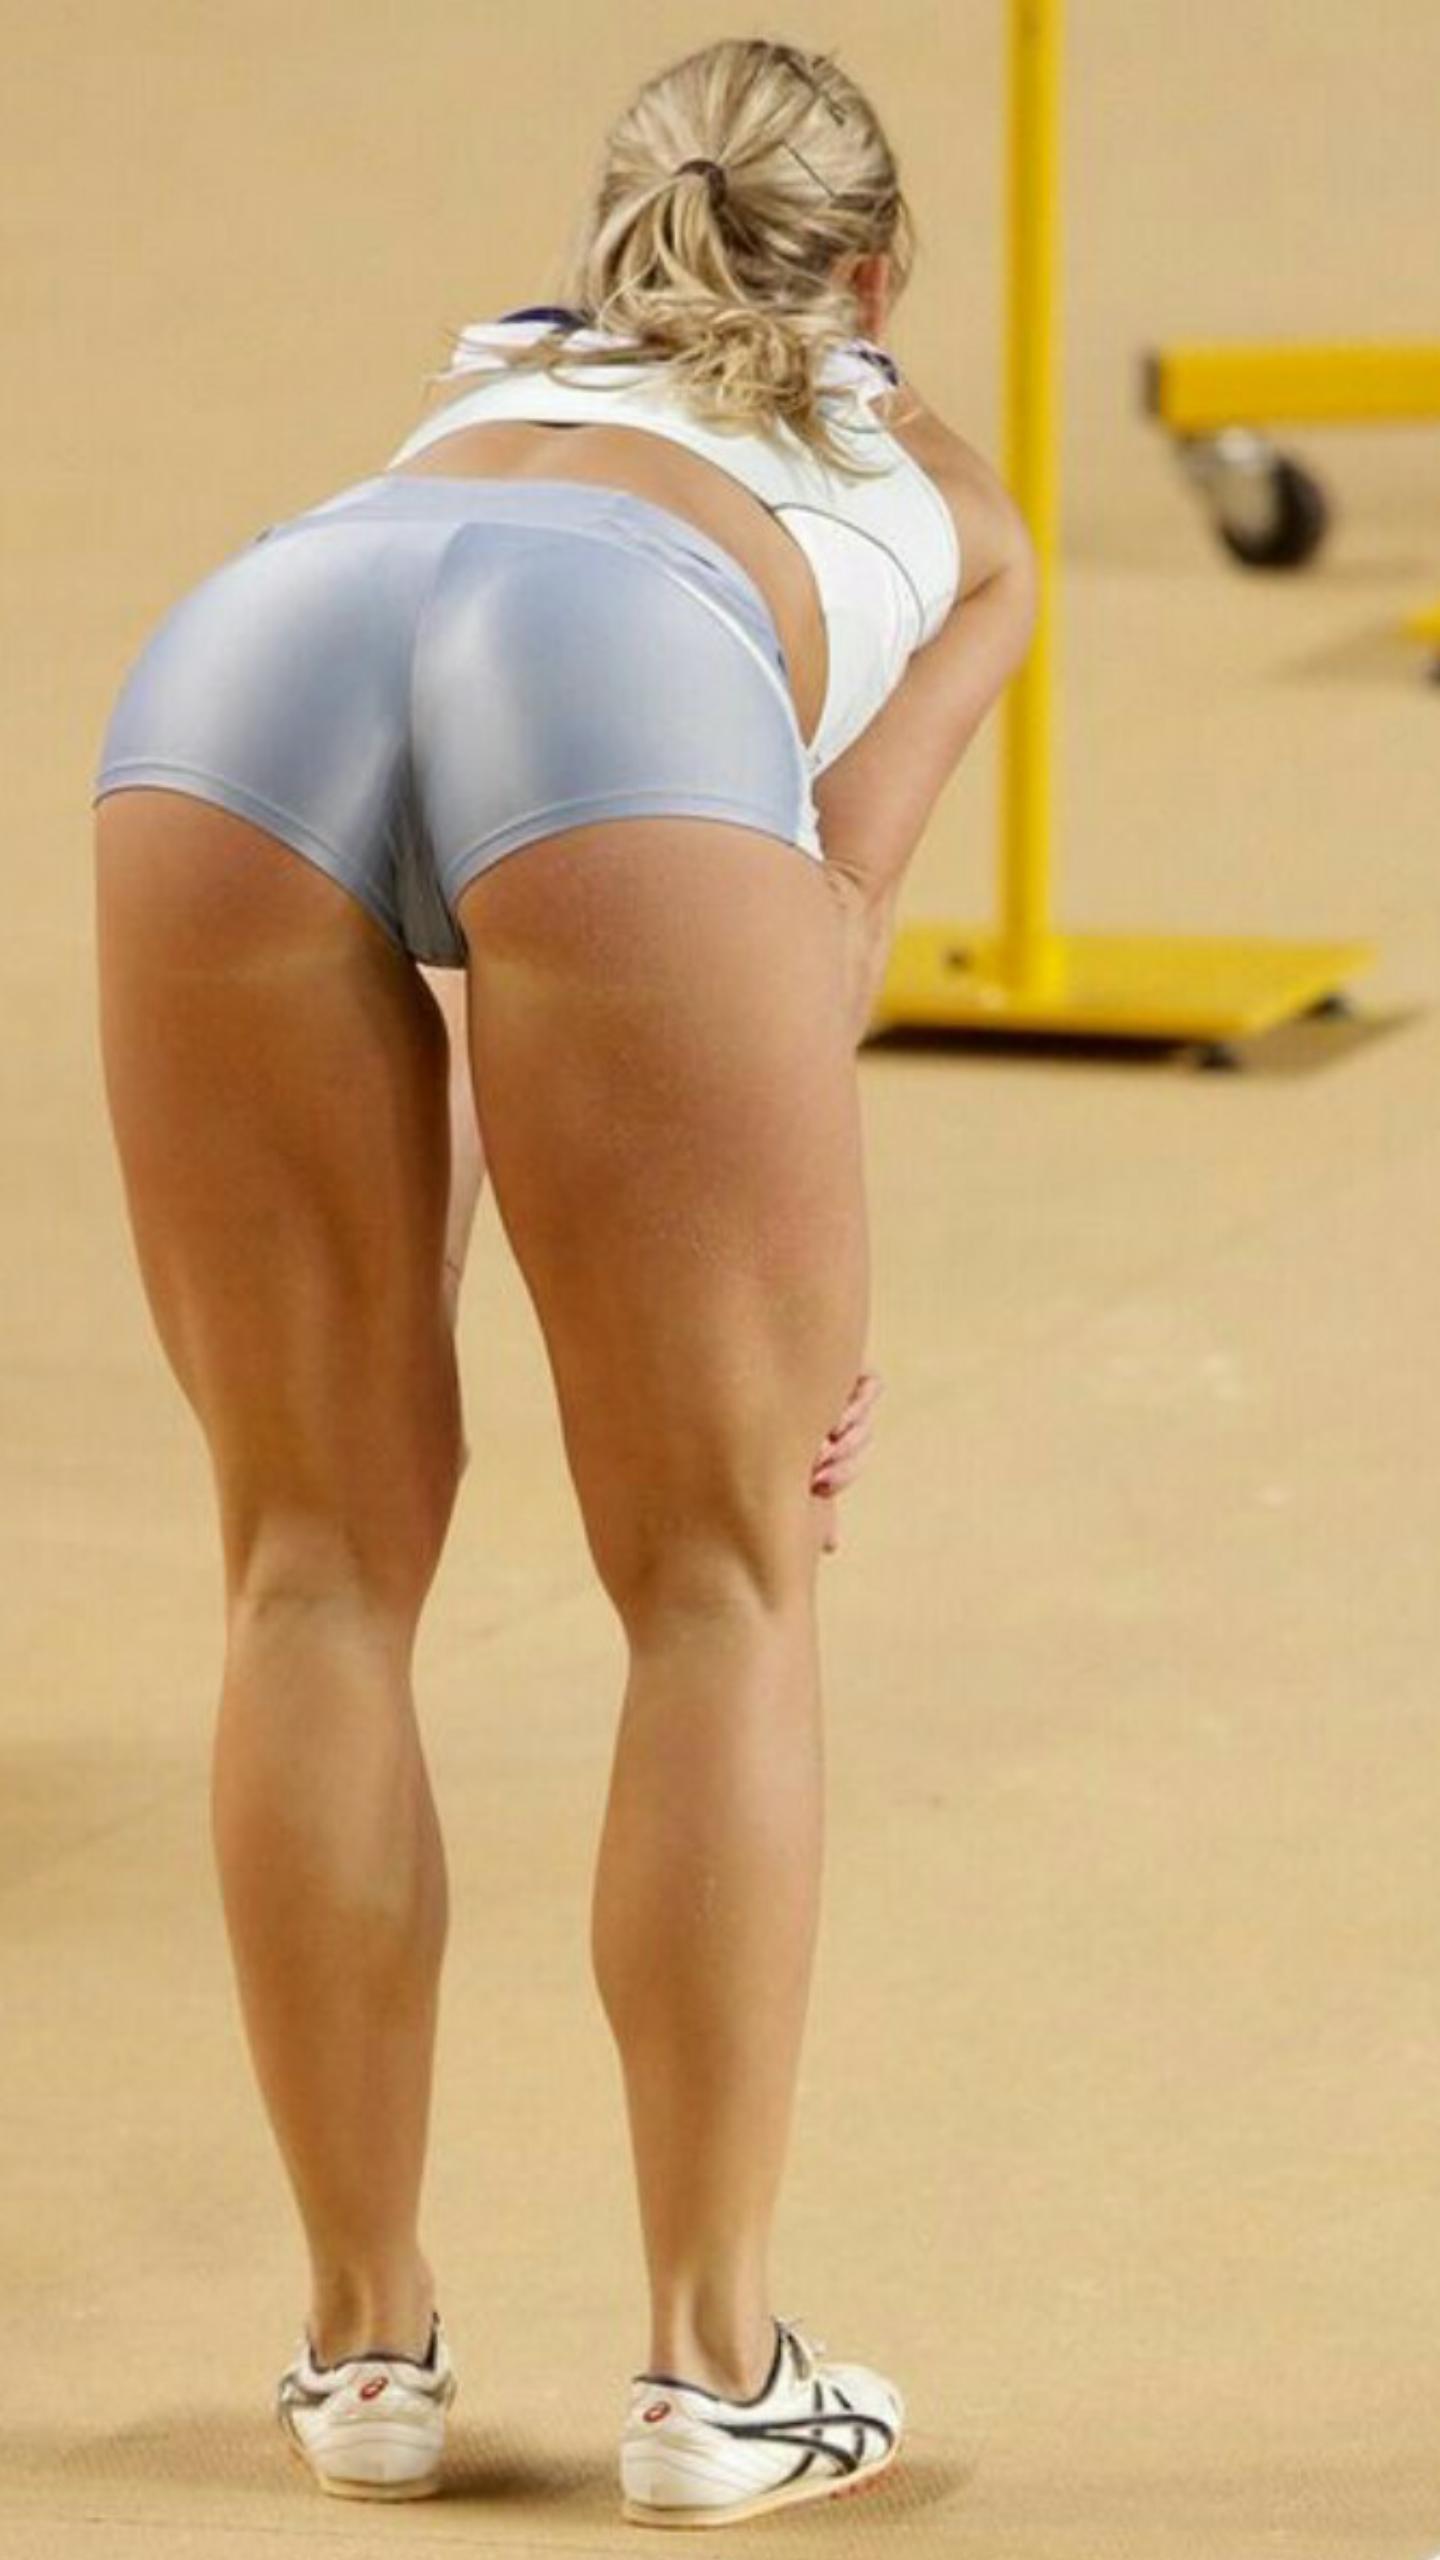 Жопа спортсменки